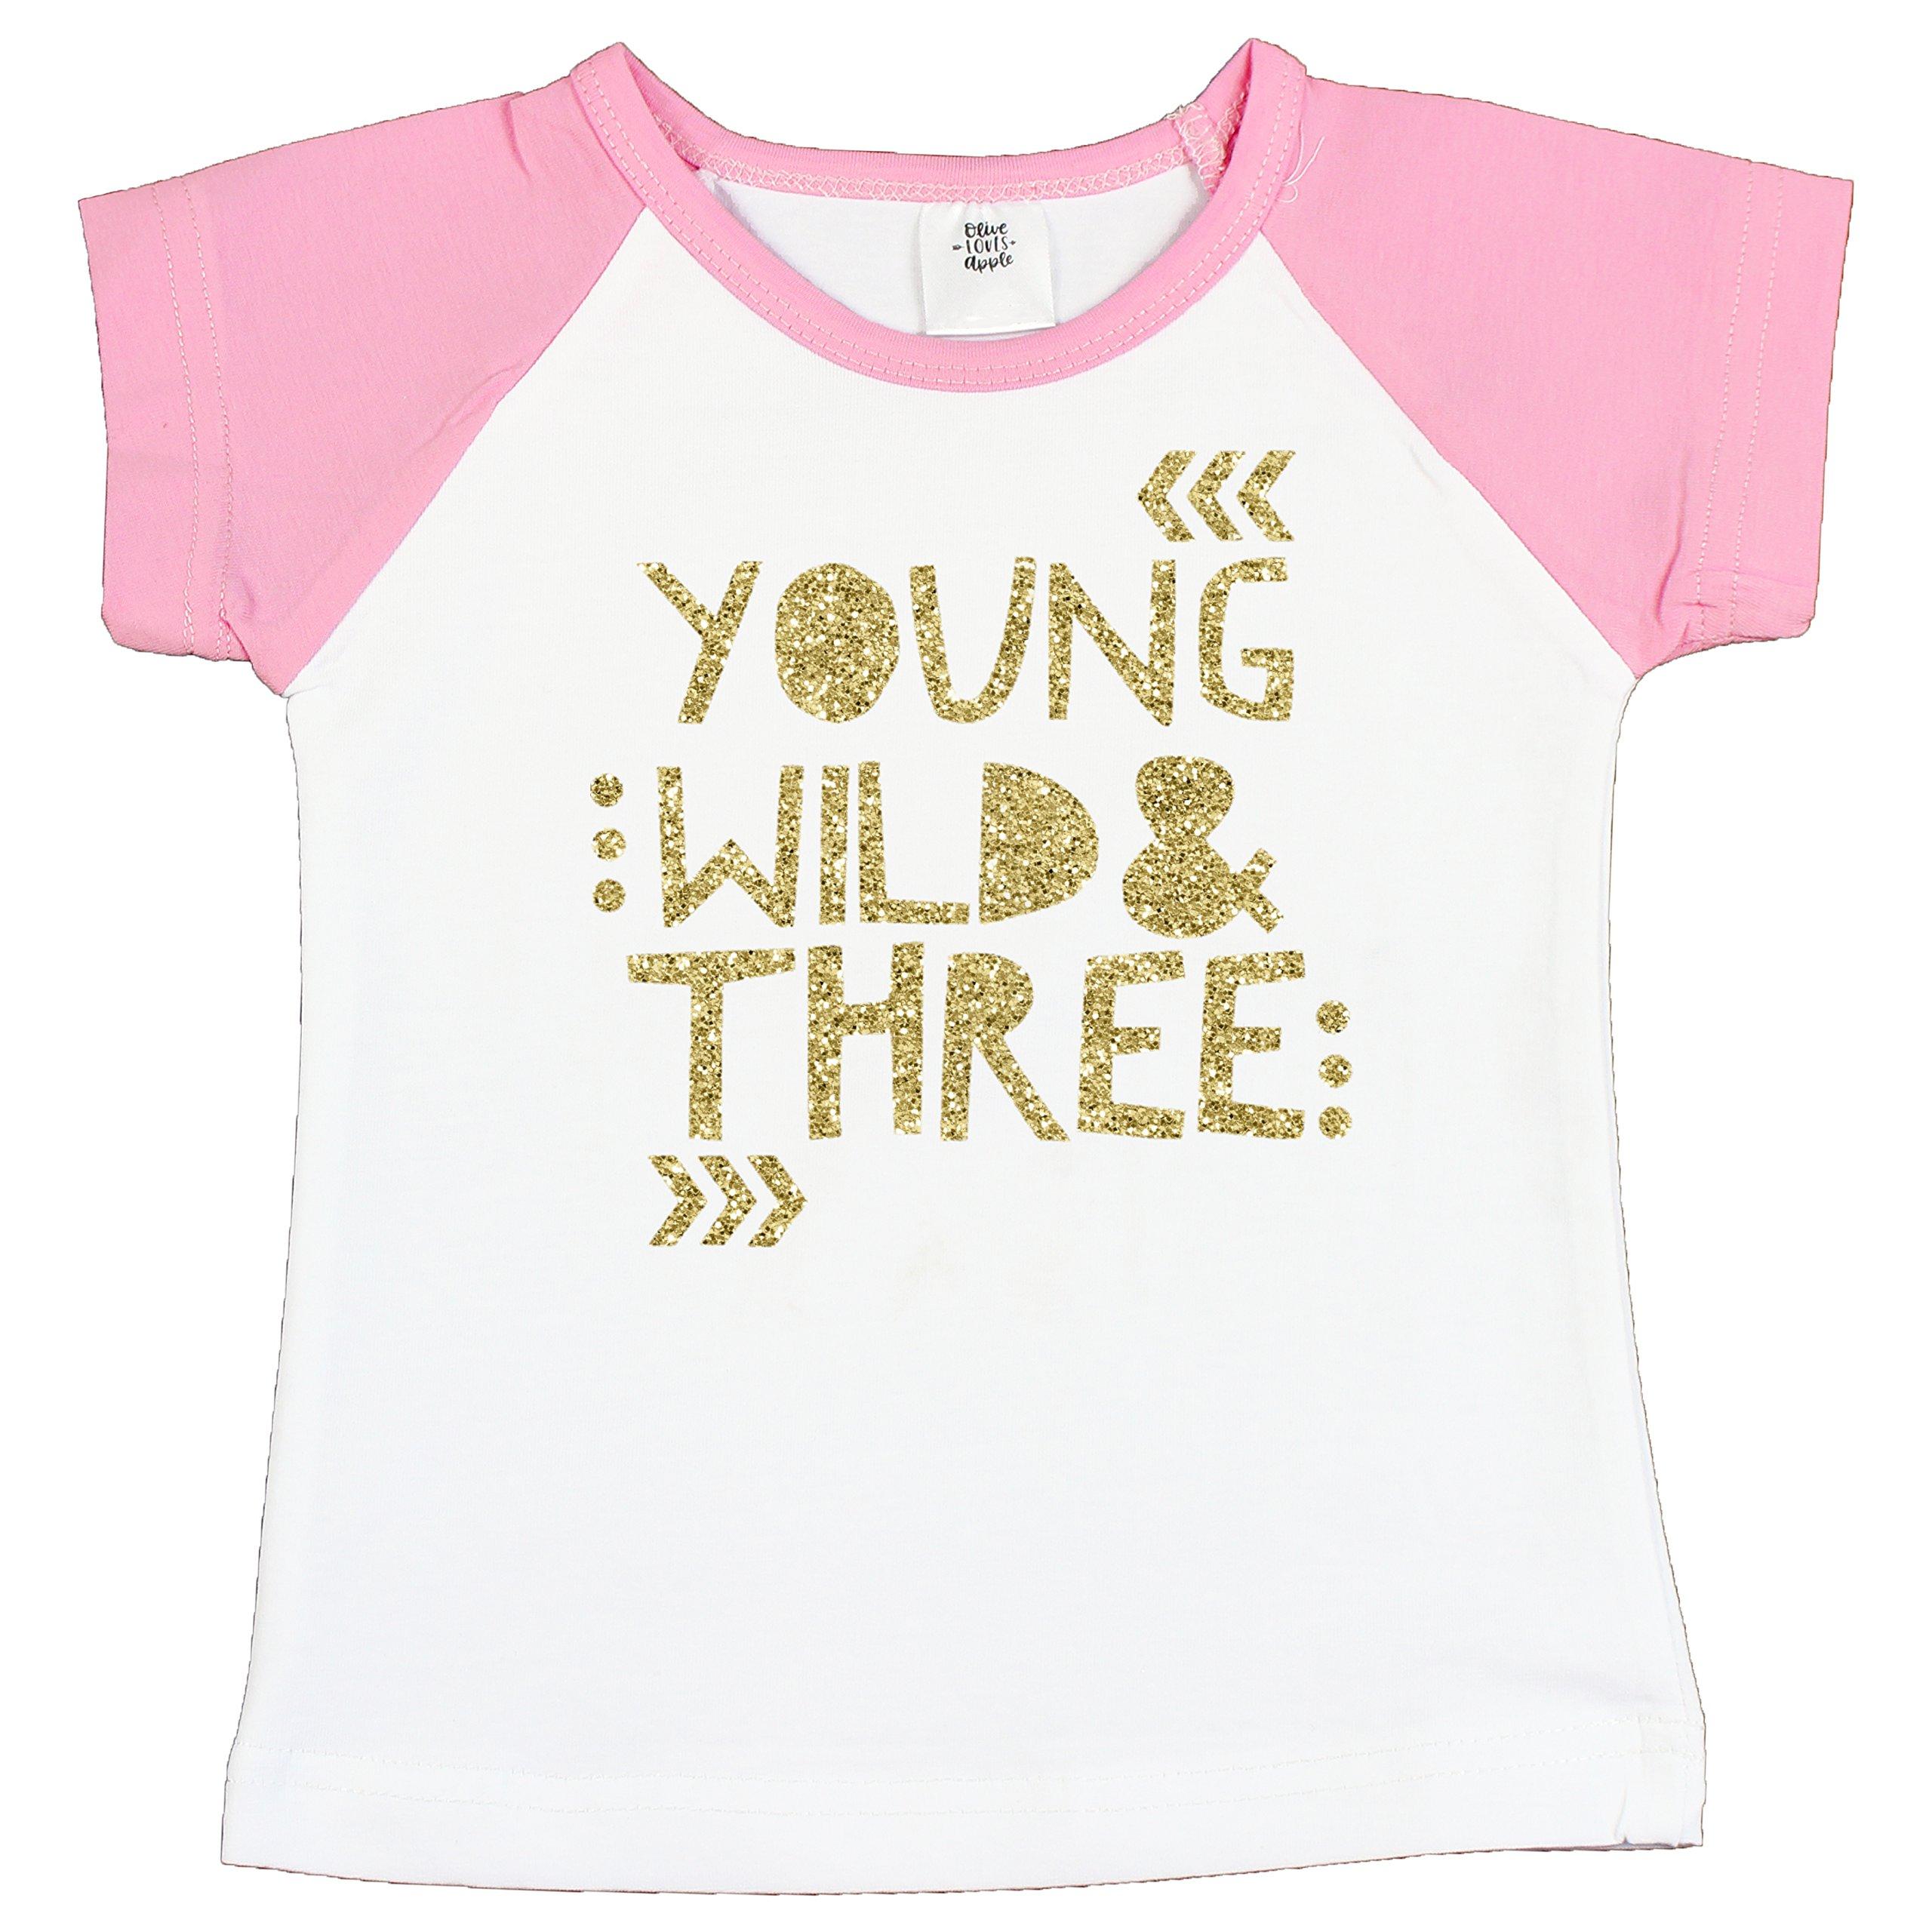 Olive Loves Apple 3rd Birthday Shirt for Girls Young Wild & Three Pink Raglan Short Sleeve